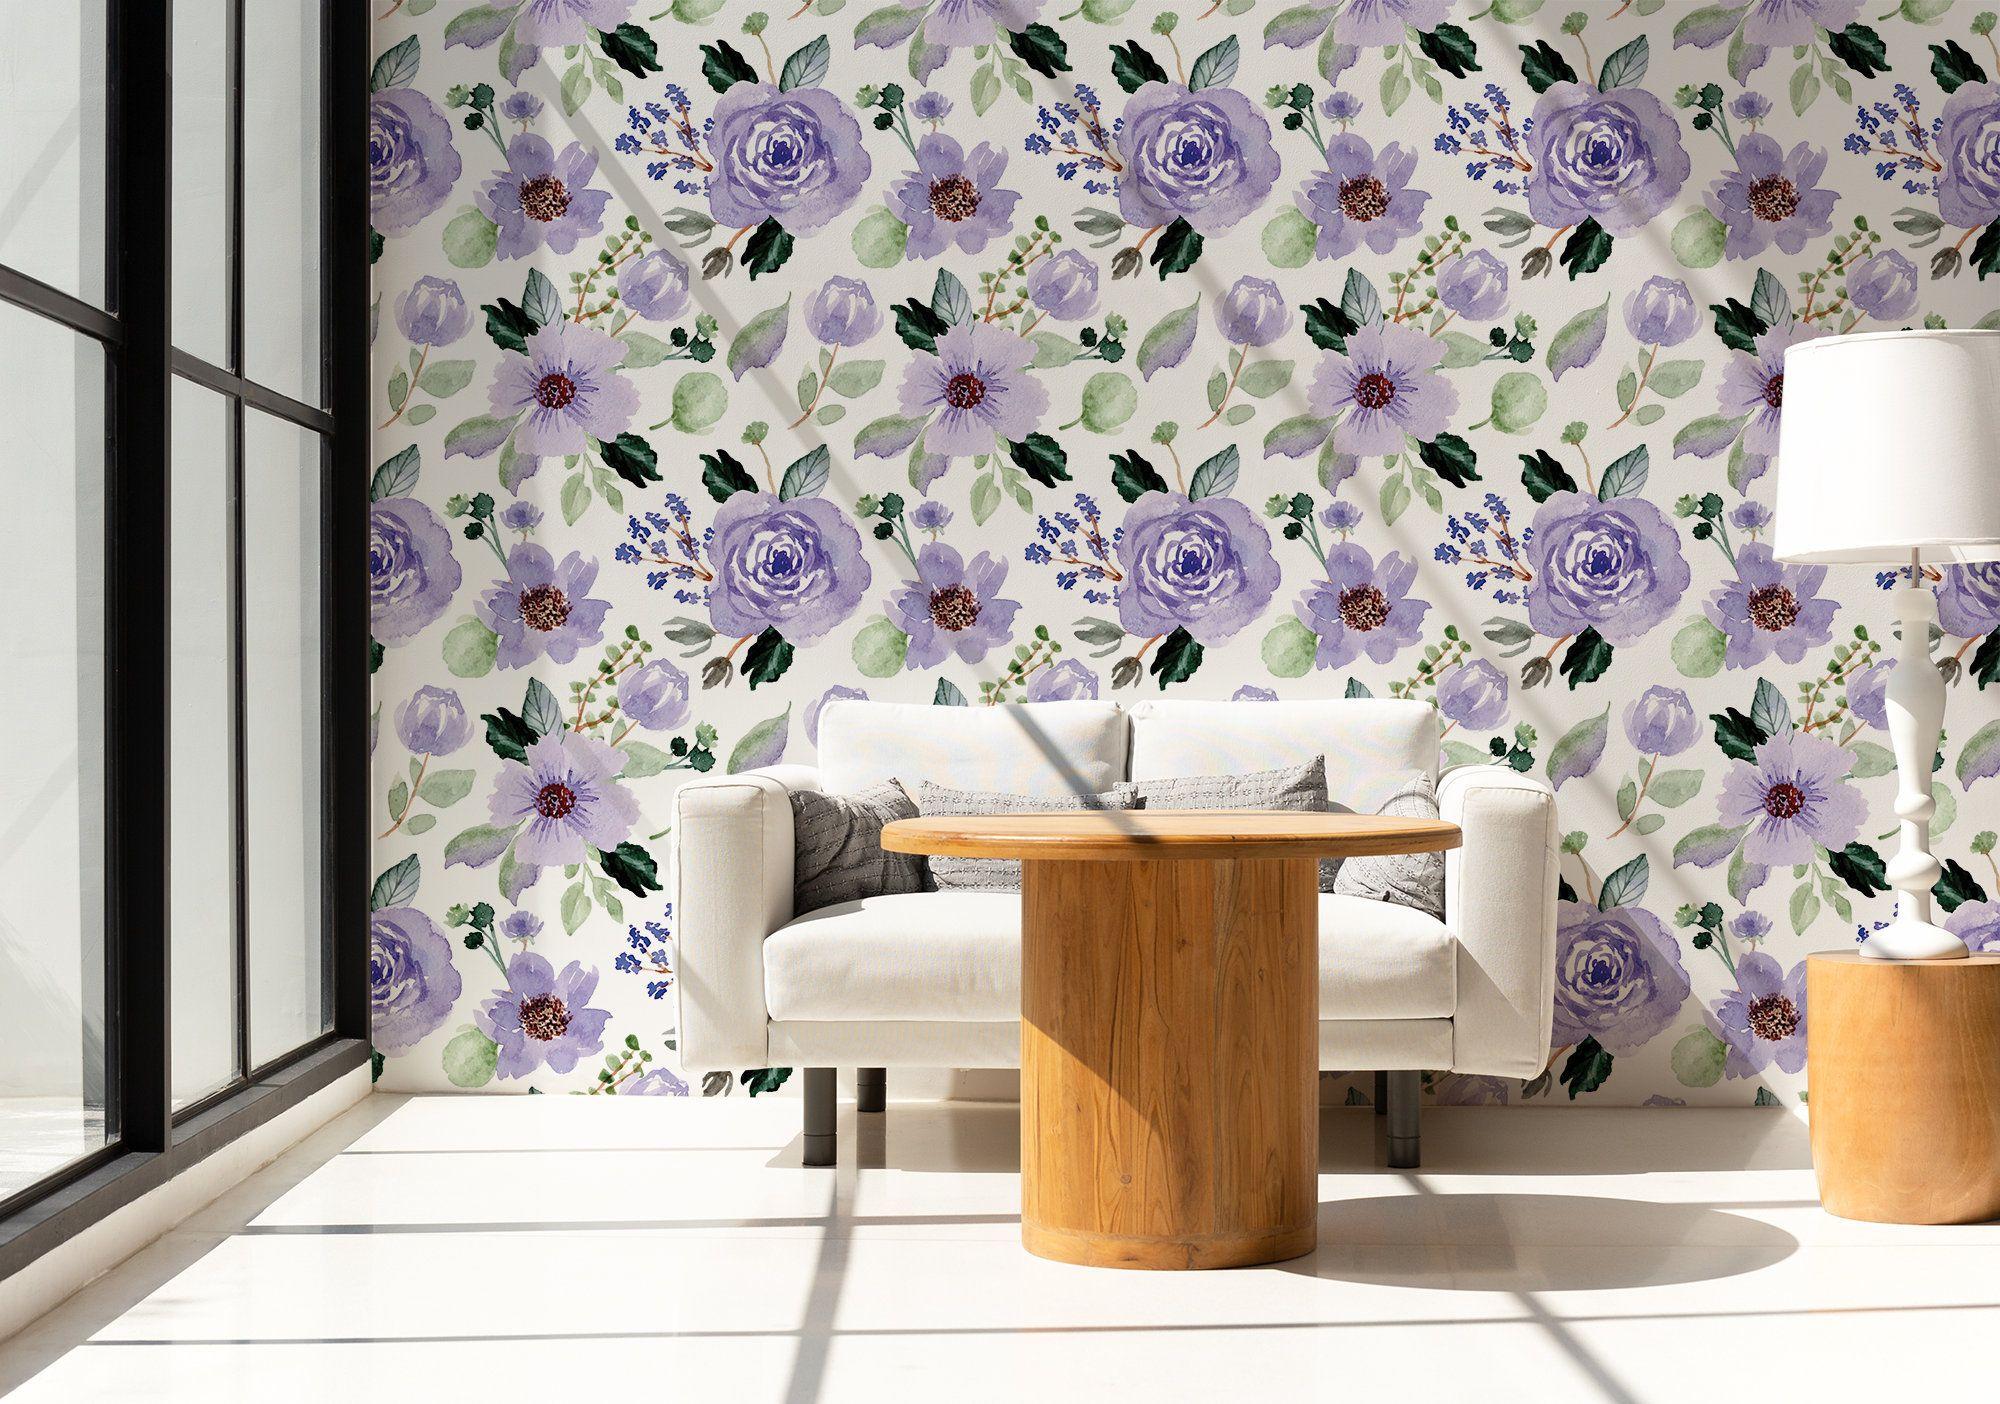 Watercolor Purple Flowers Wallpaper Self Adhesive Peel Stick Removable In 2020 Purple Flowers Wallpaper Flower Wallpaper Purple Flowers